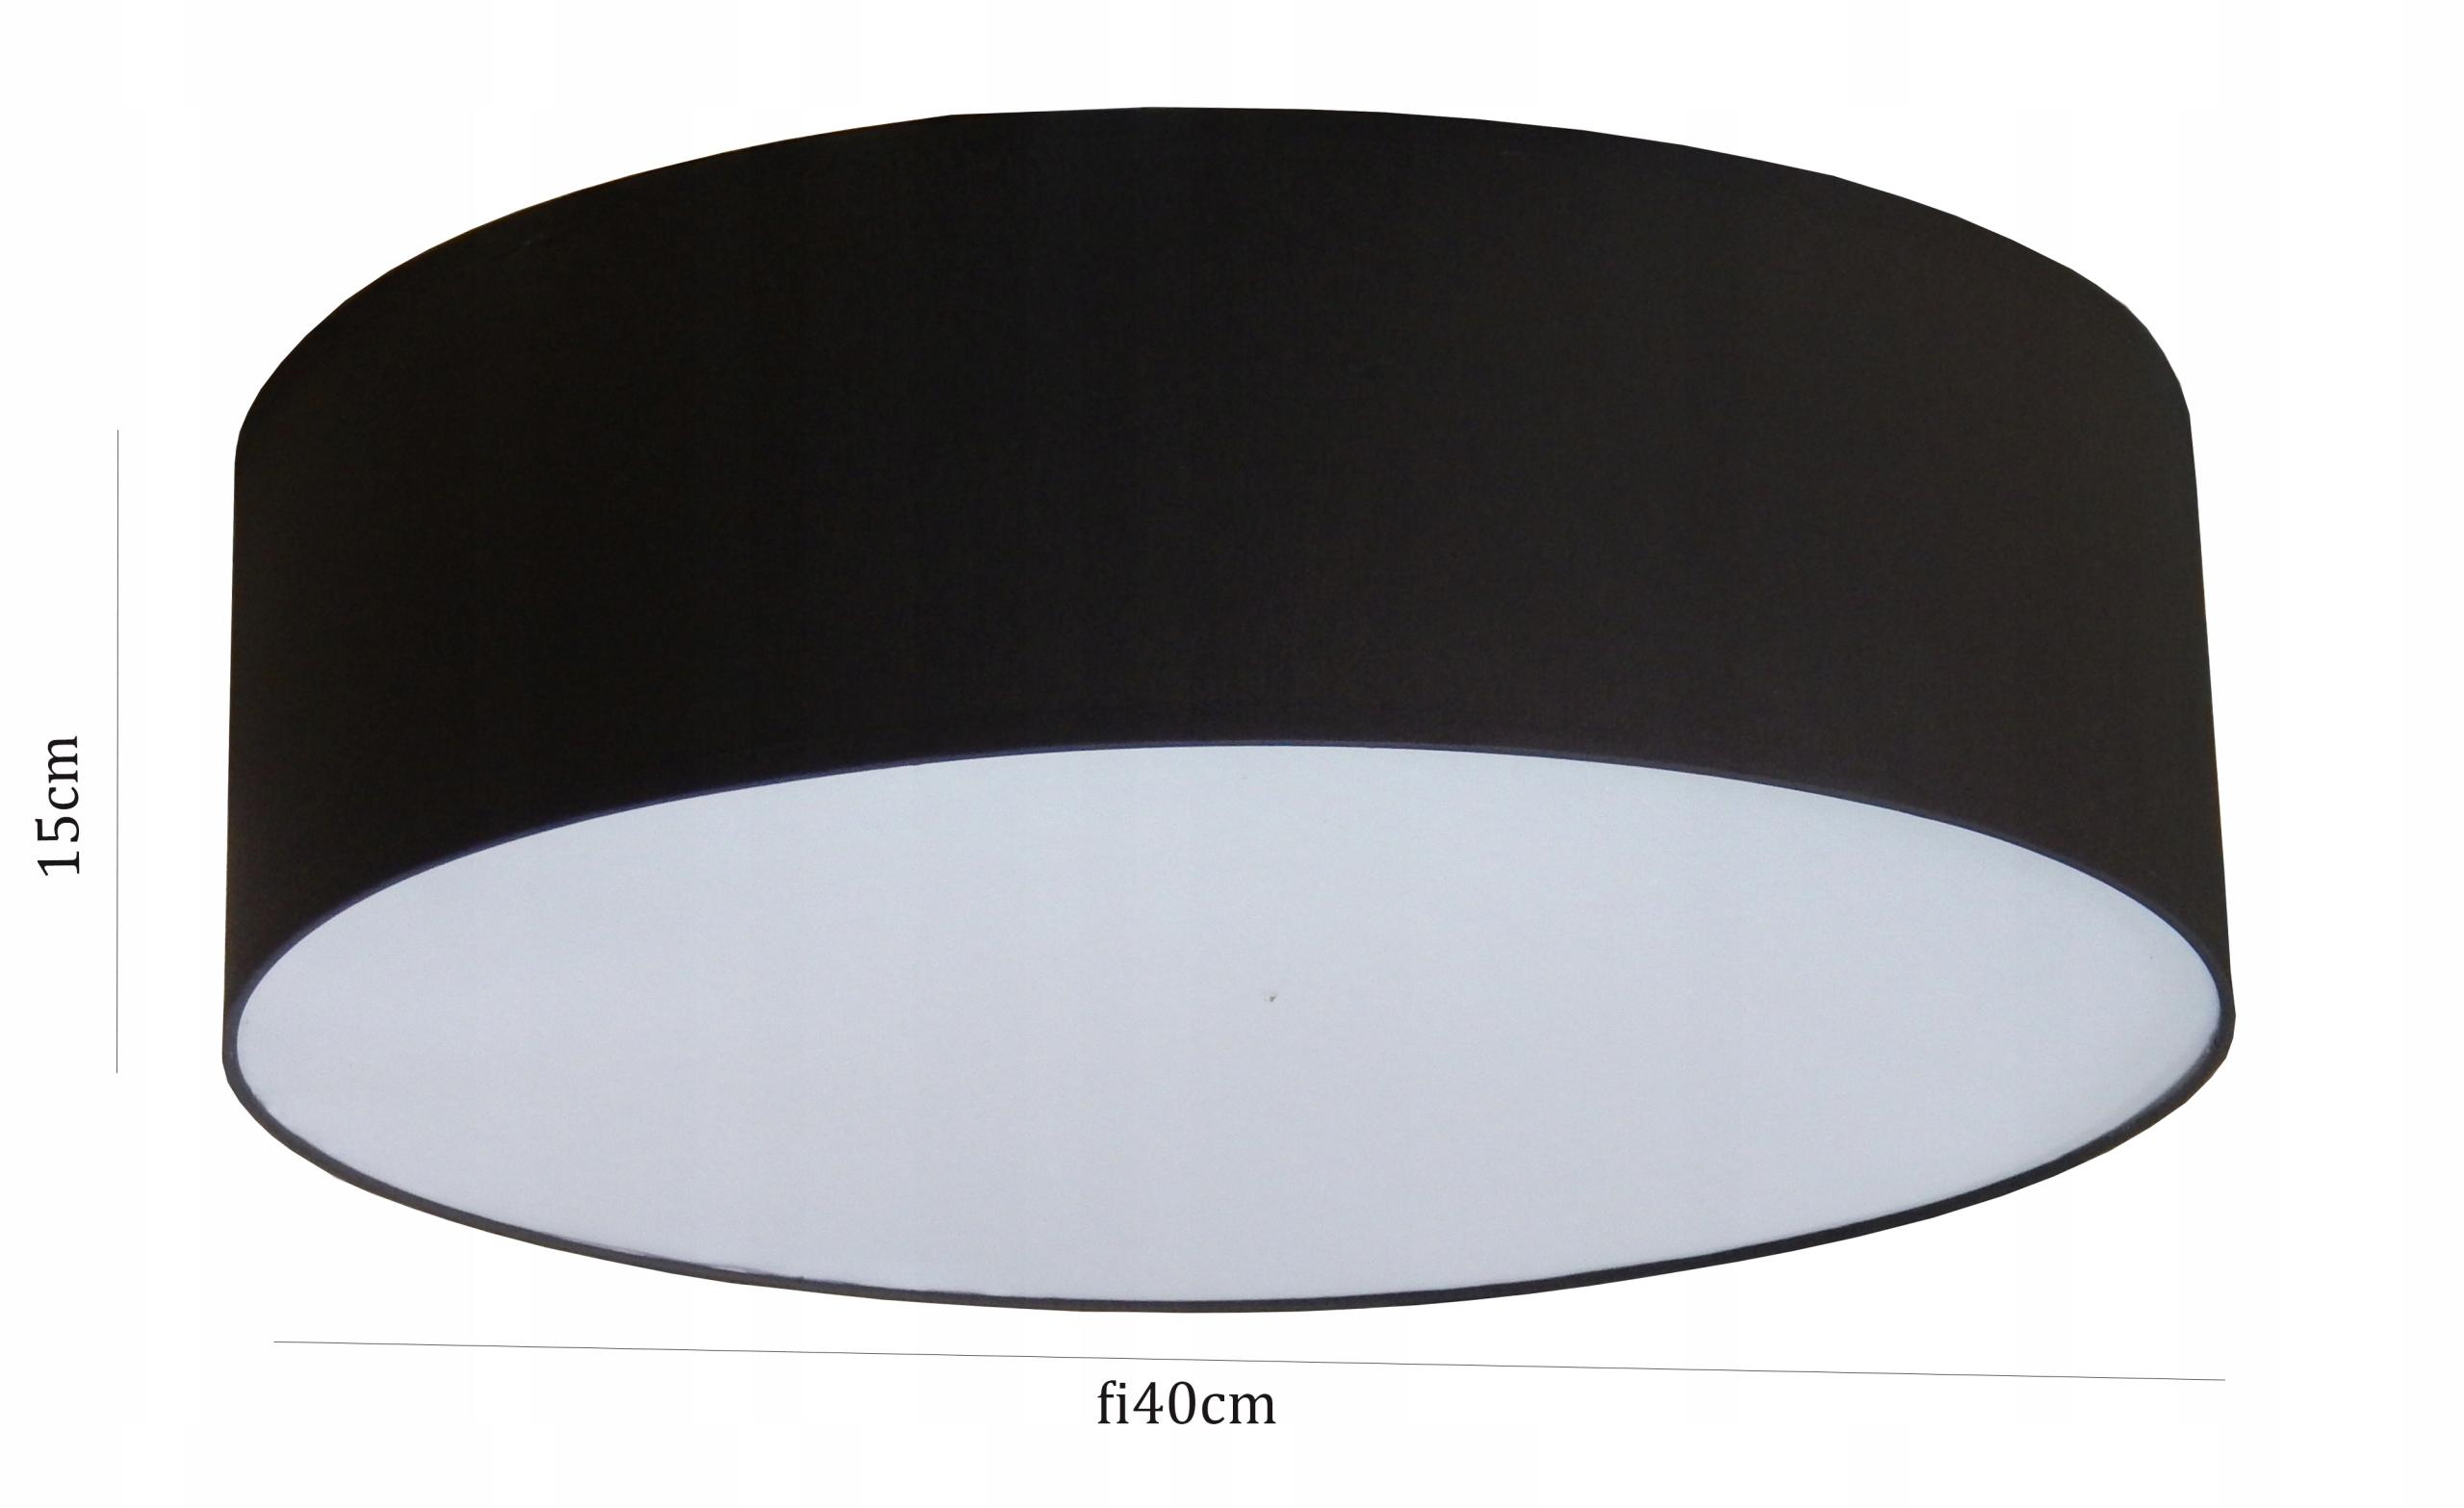 LAMPAPLAFON SUFITOWY typ:LP 2 LED, ABAŻUR 40cm!